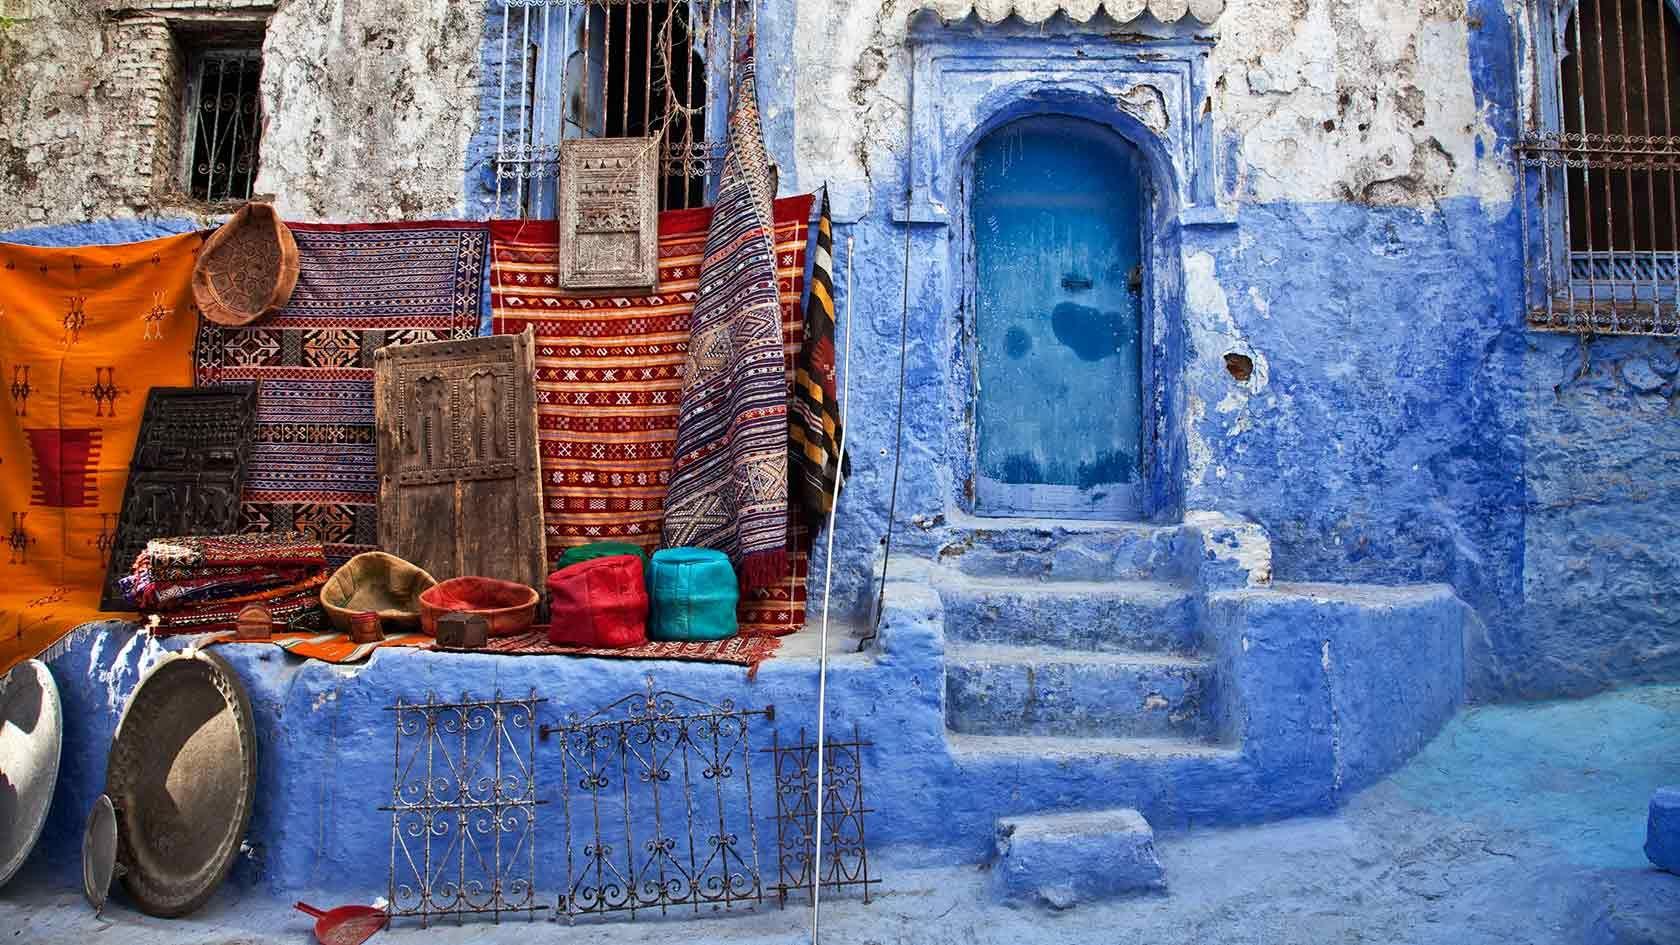 Resultado de imagen para Chaouen morocco